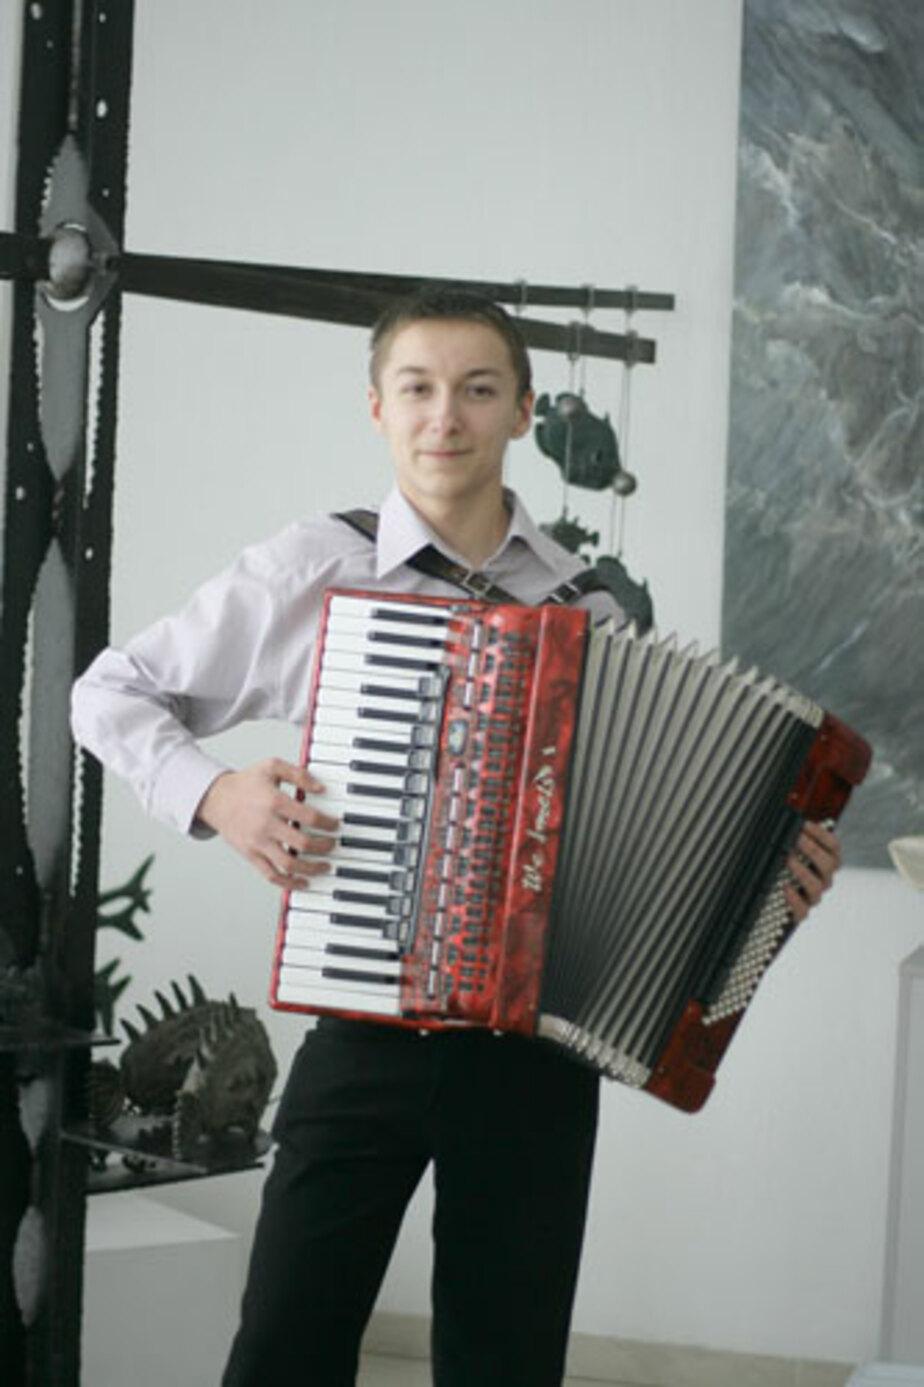 Любимый инструмент – аккордеон - Новости Калининграда